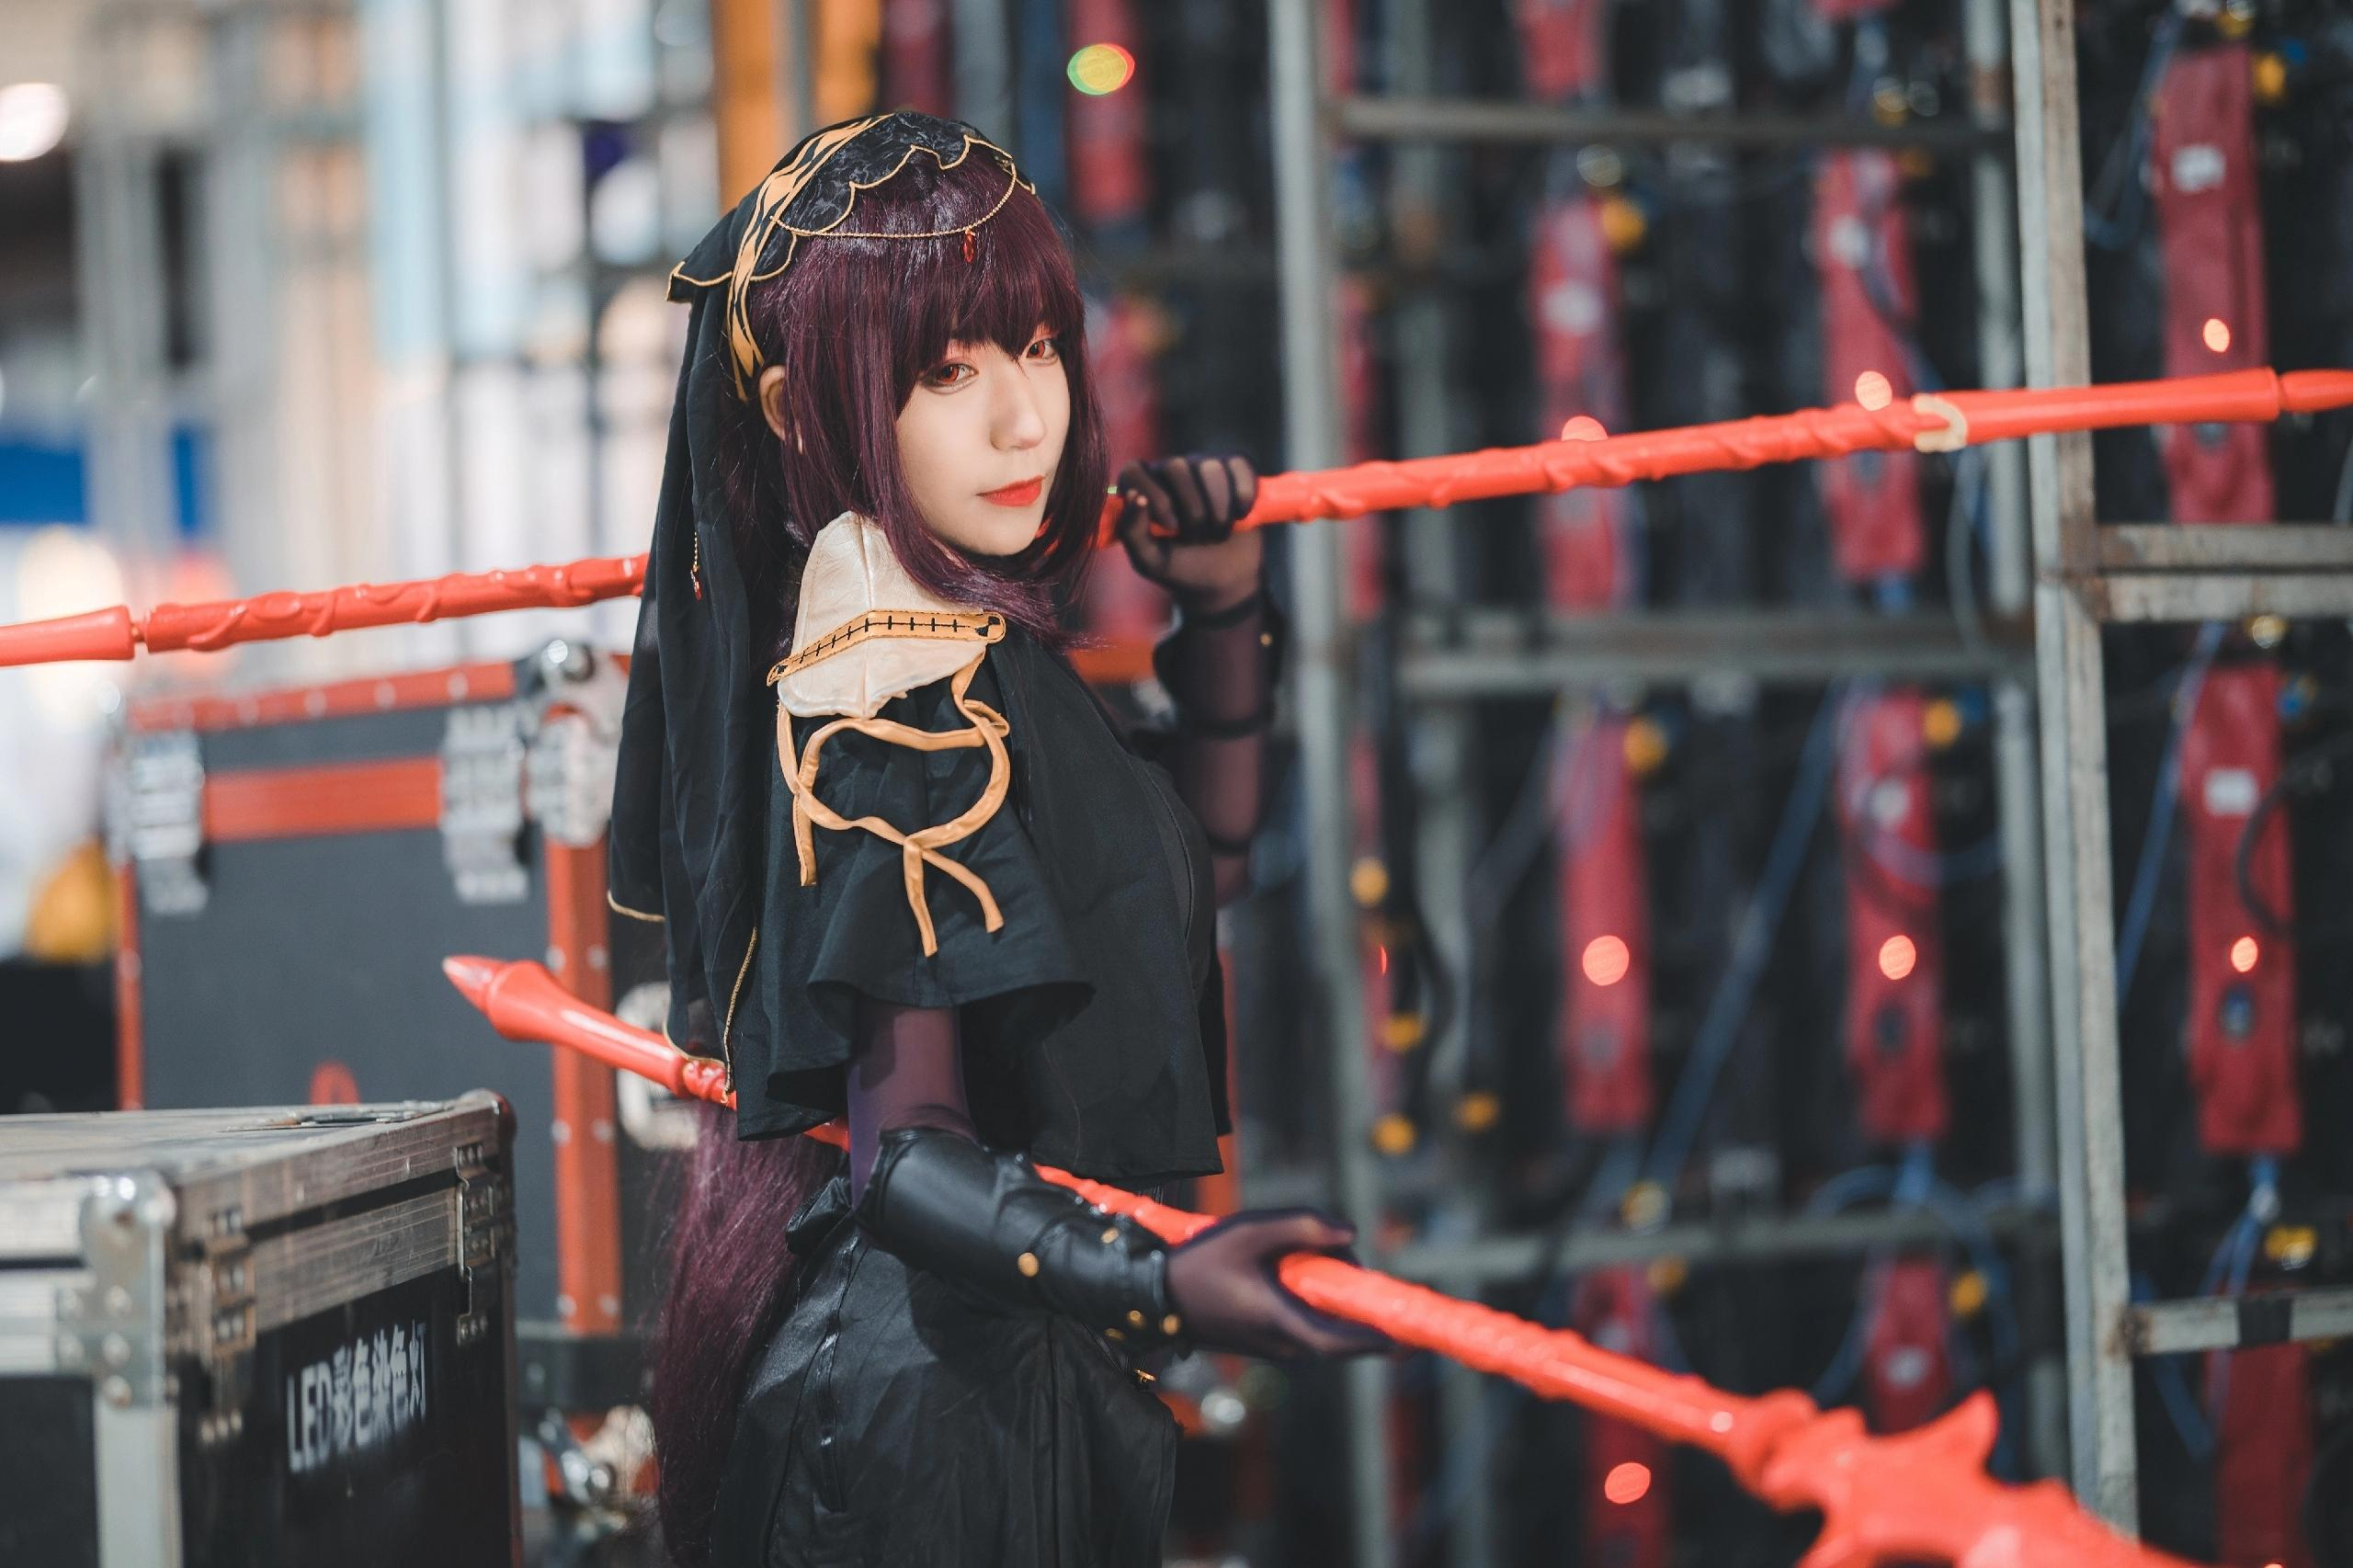 《FATE/GRAND ORDER》漫展cosplay【CN:COSER赤瞳_菌】-第6张